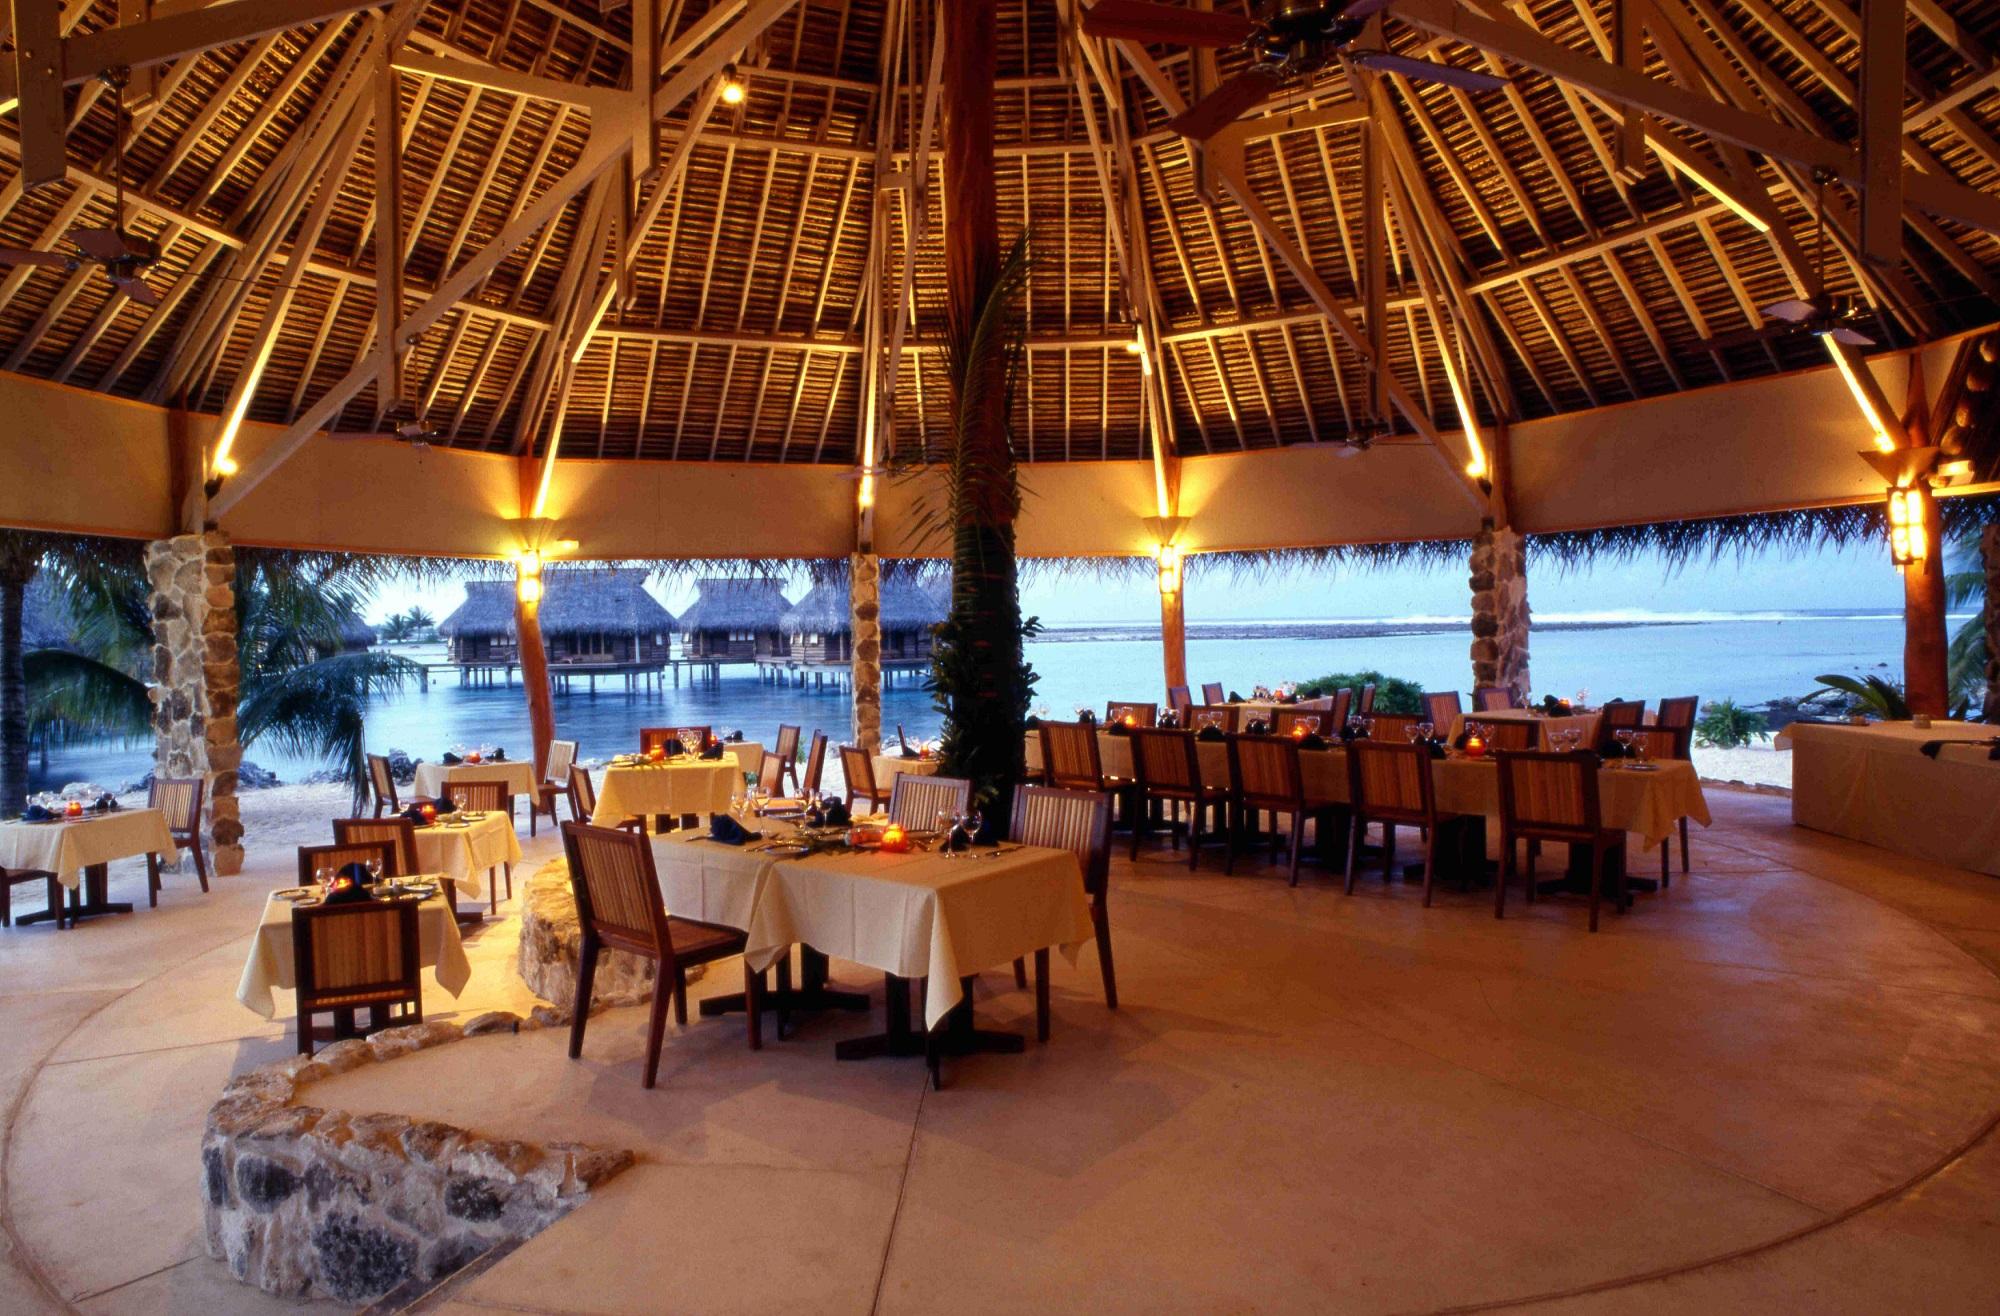 https://tahititourisme.com.au/wp-content/uploads/2021/10/Tikehau-Pearl-Beach-Resort-Restaurant-Pohero-Copie.jpg